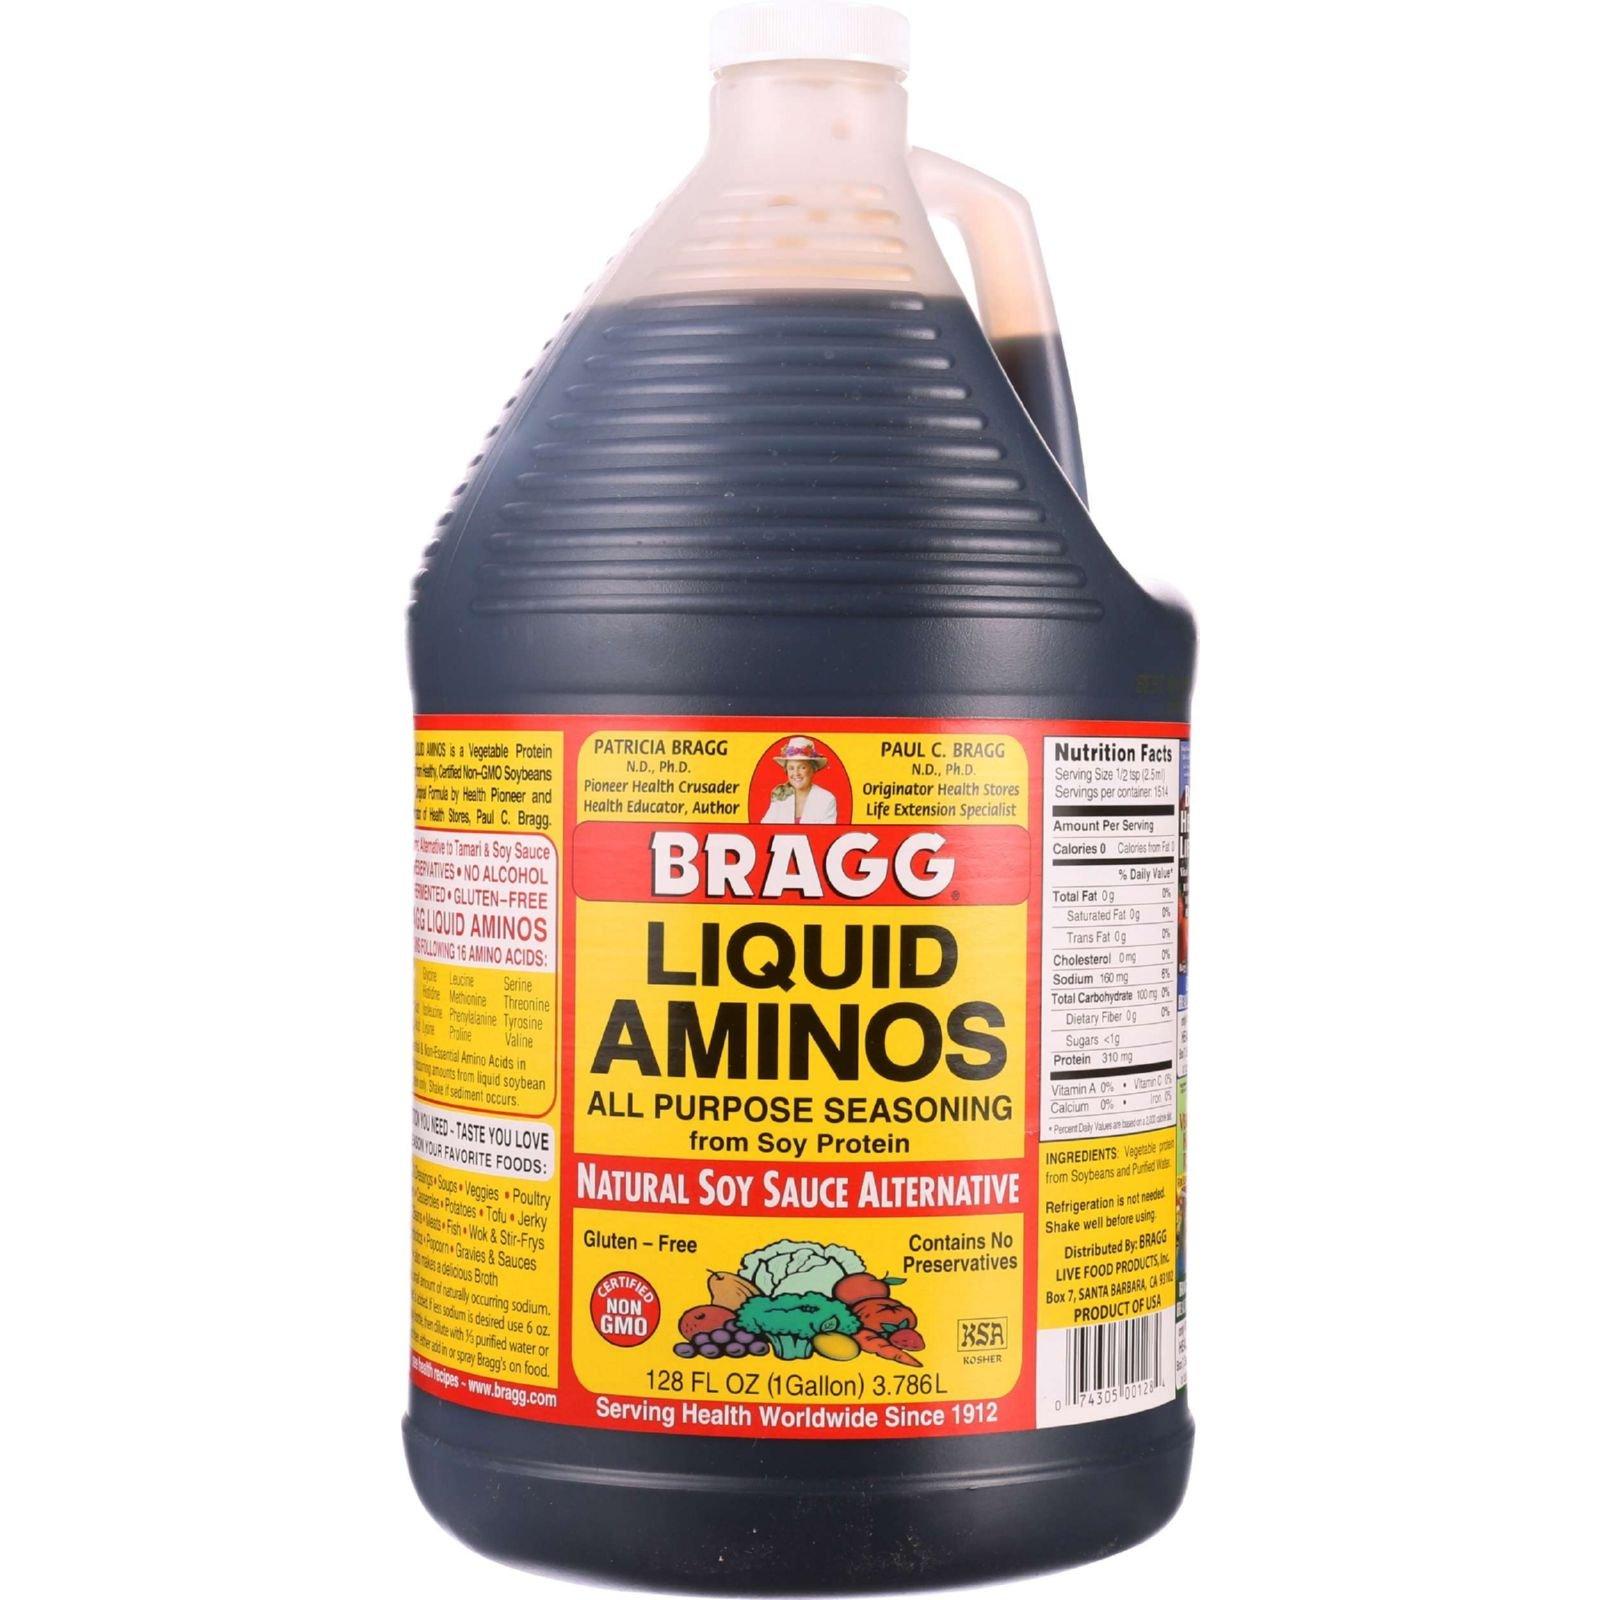 Bragg Liquid Aminos - 128 oz - case of 4 - - Gluten Free - - - -